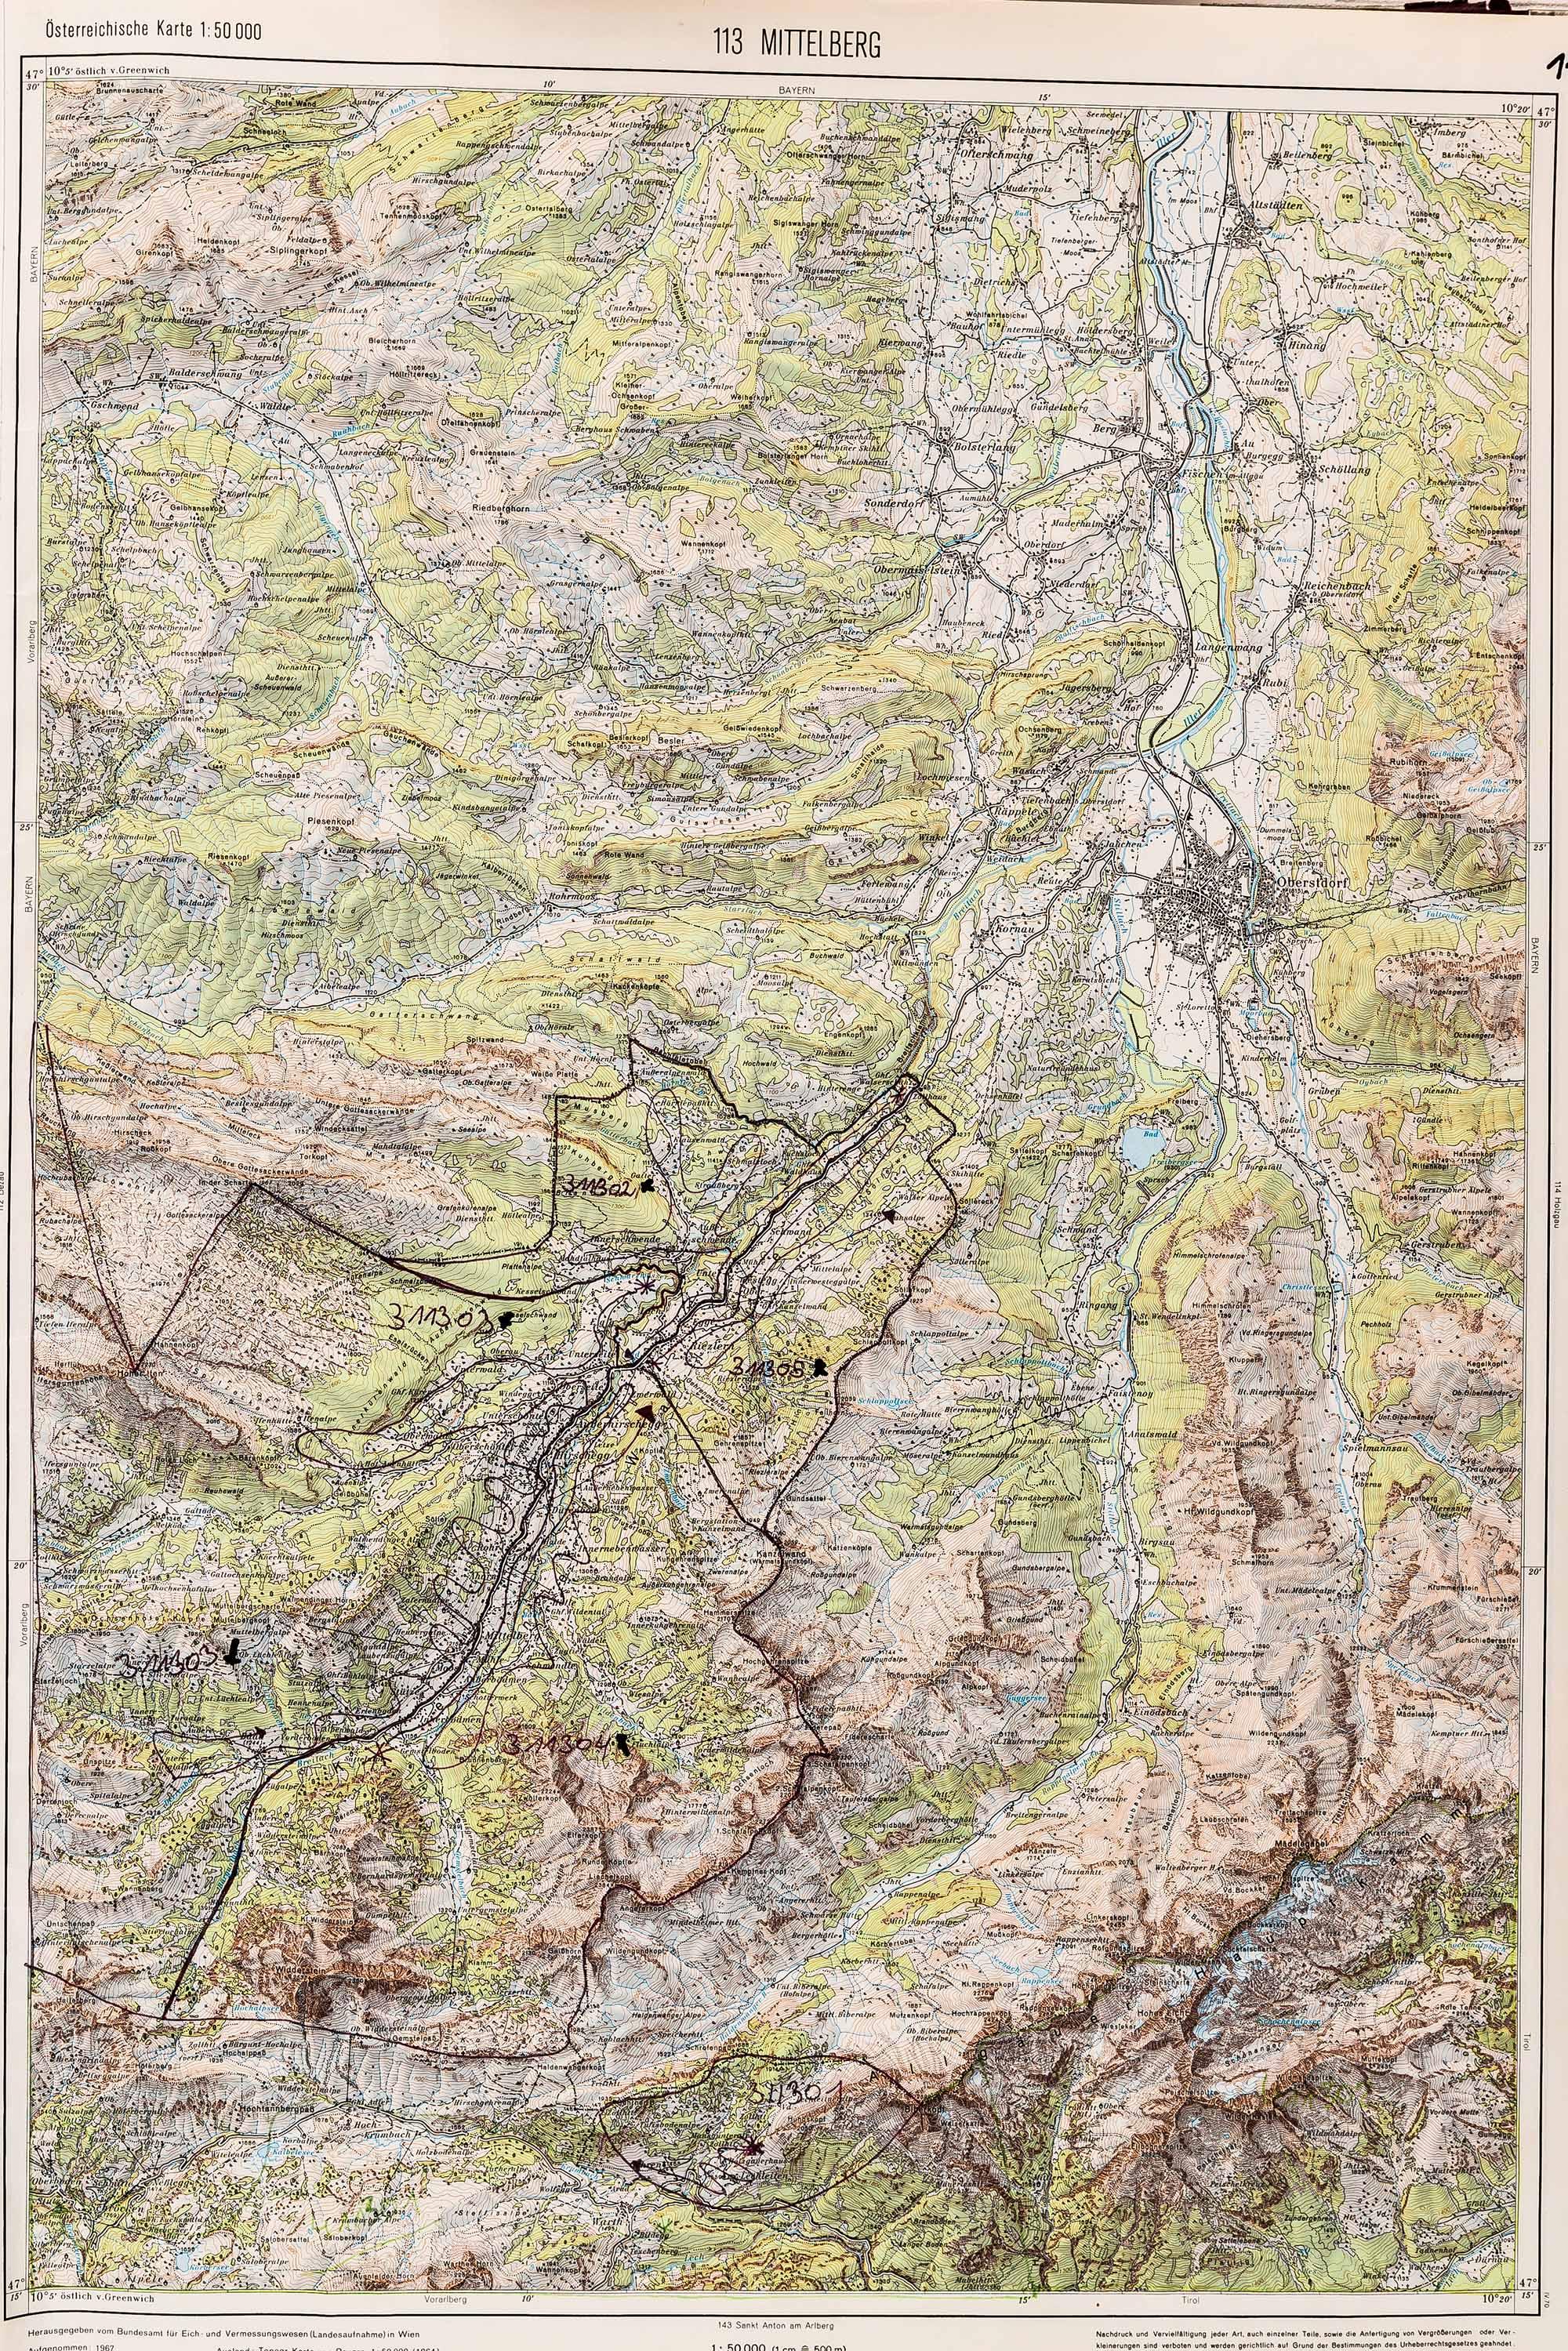 1983-1986 Karte 113